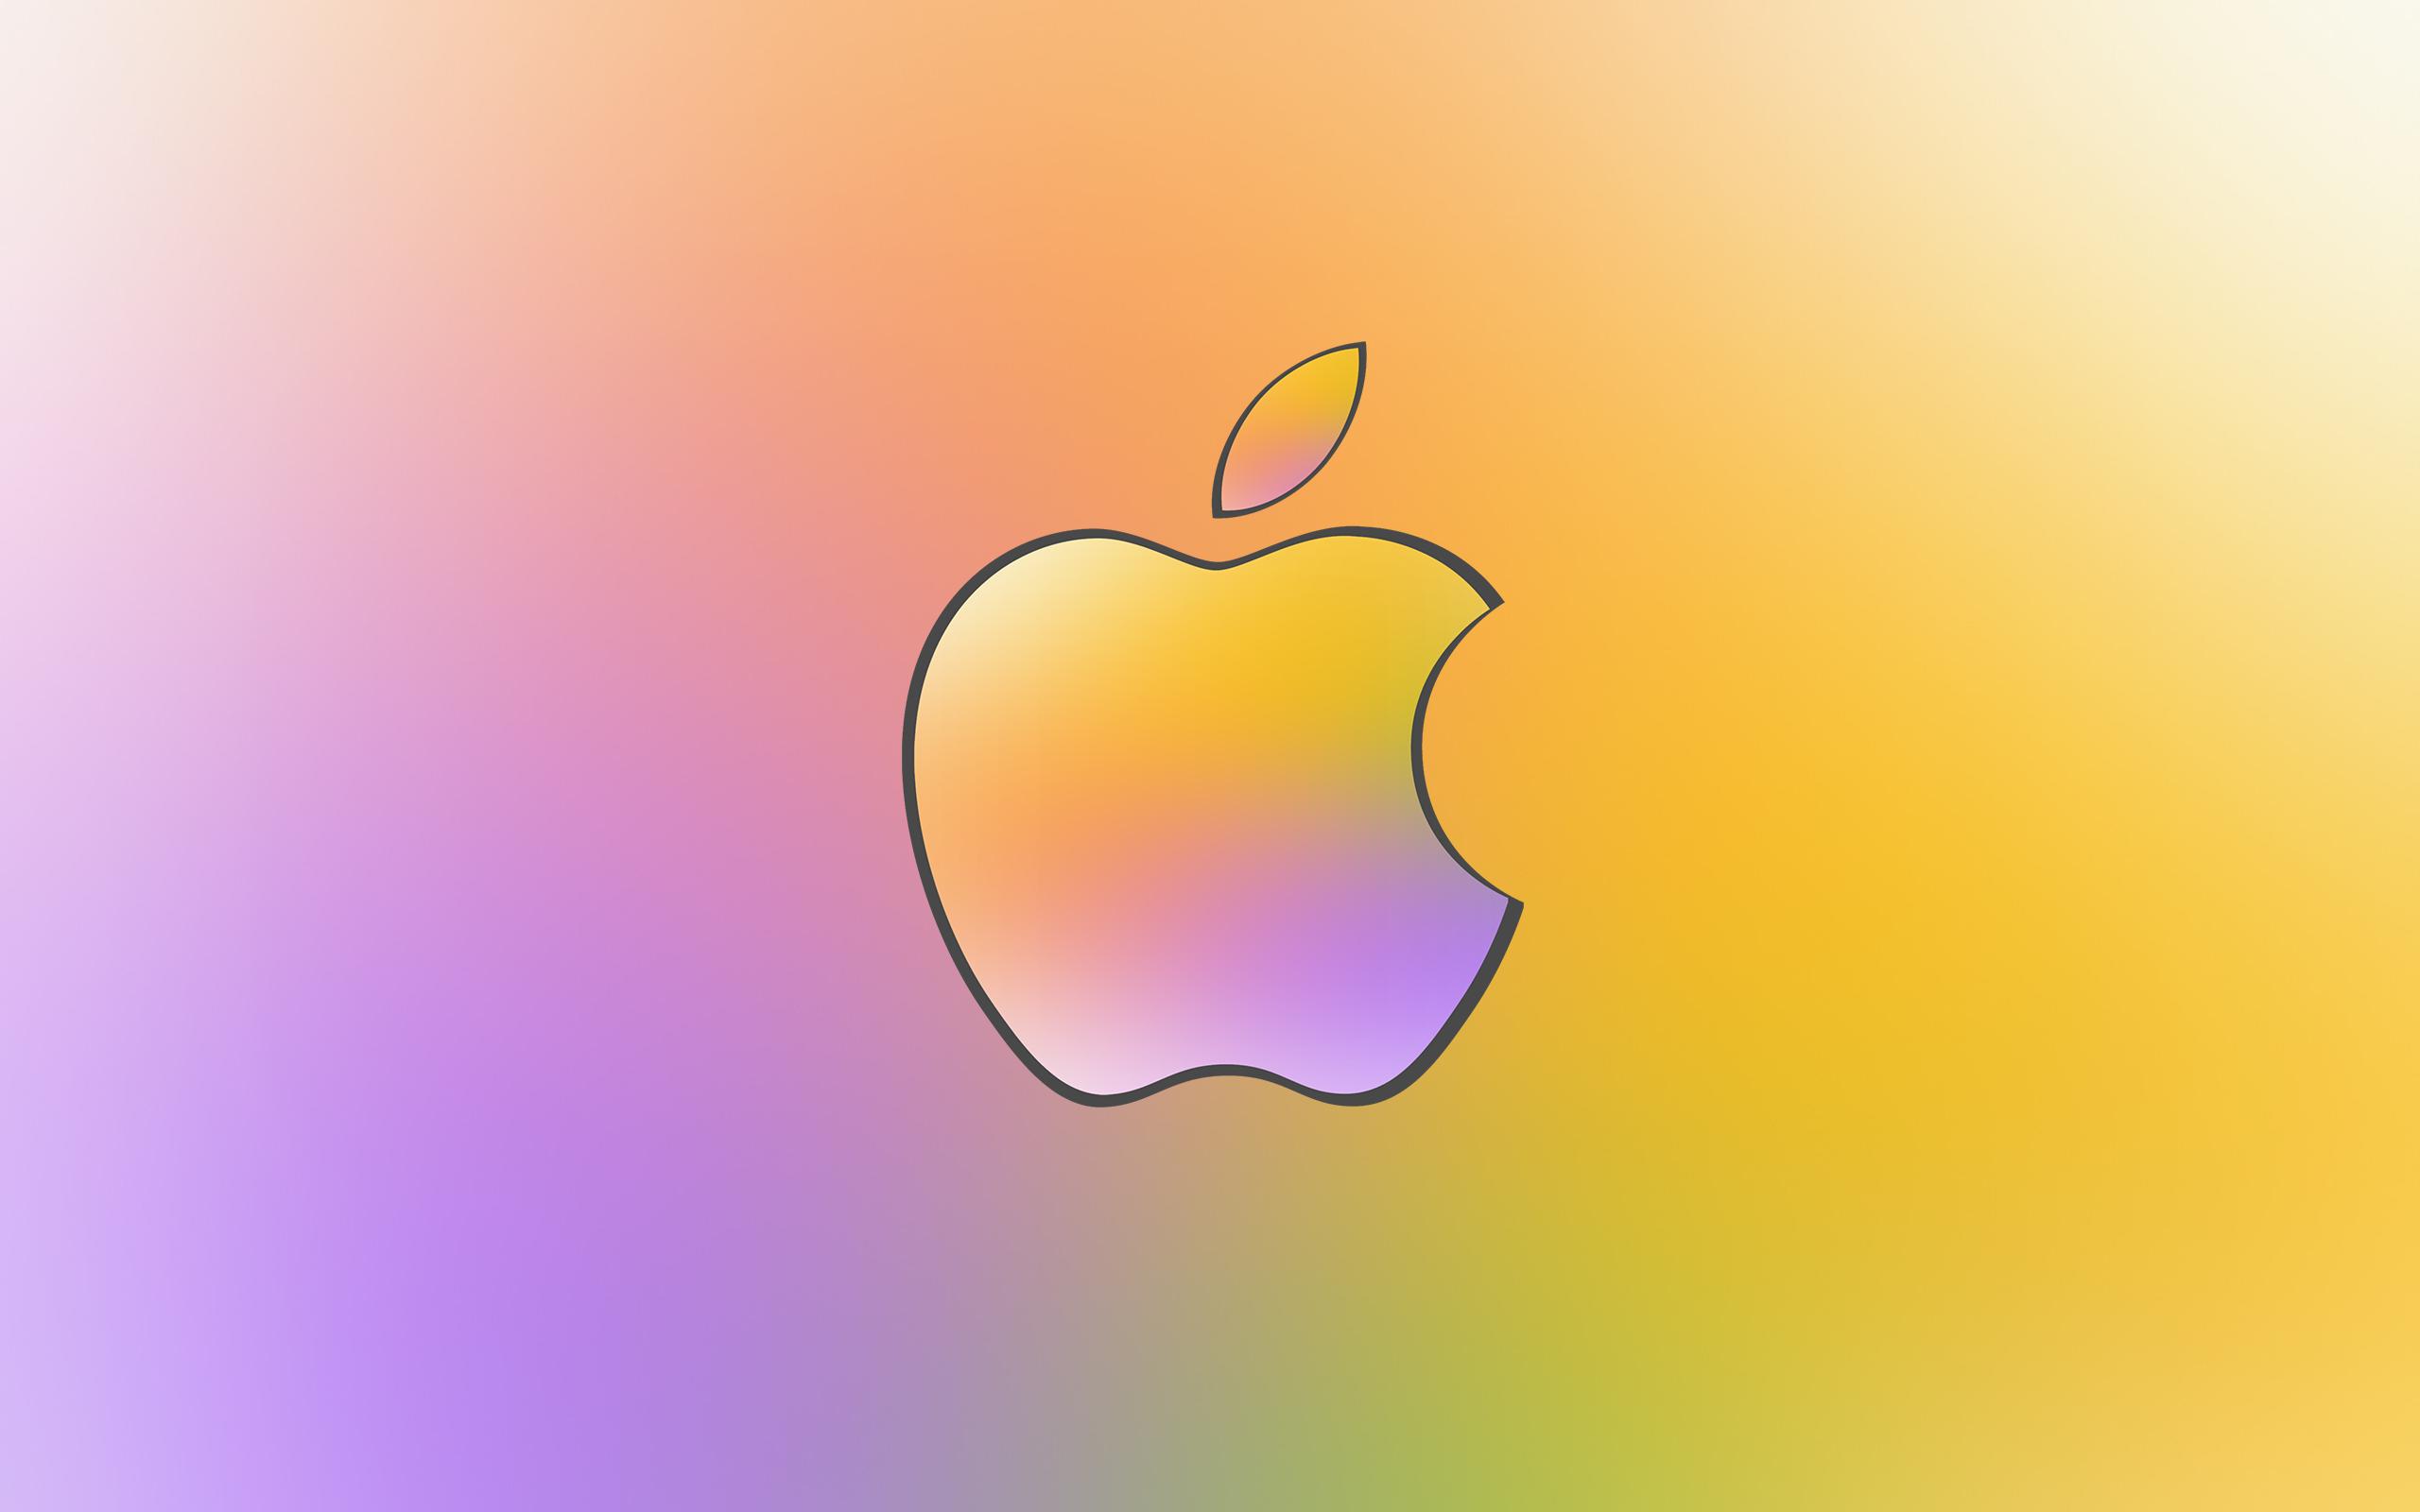 Apple iPad Background